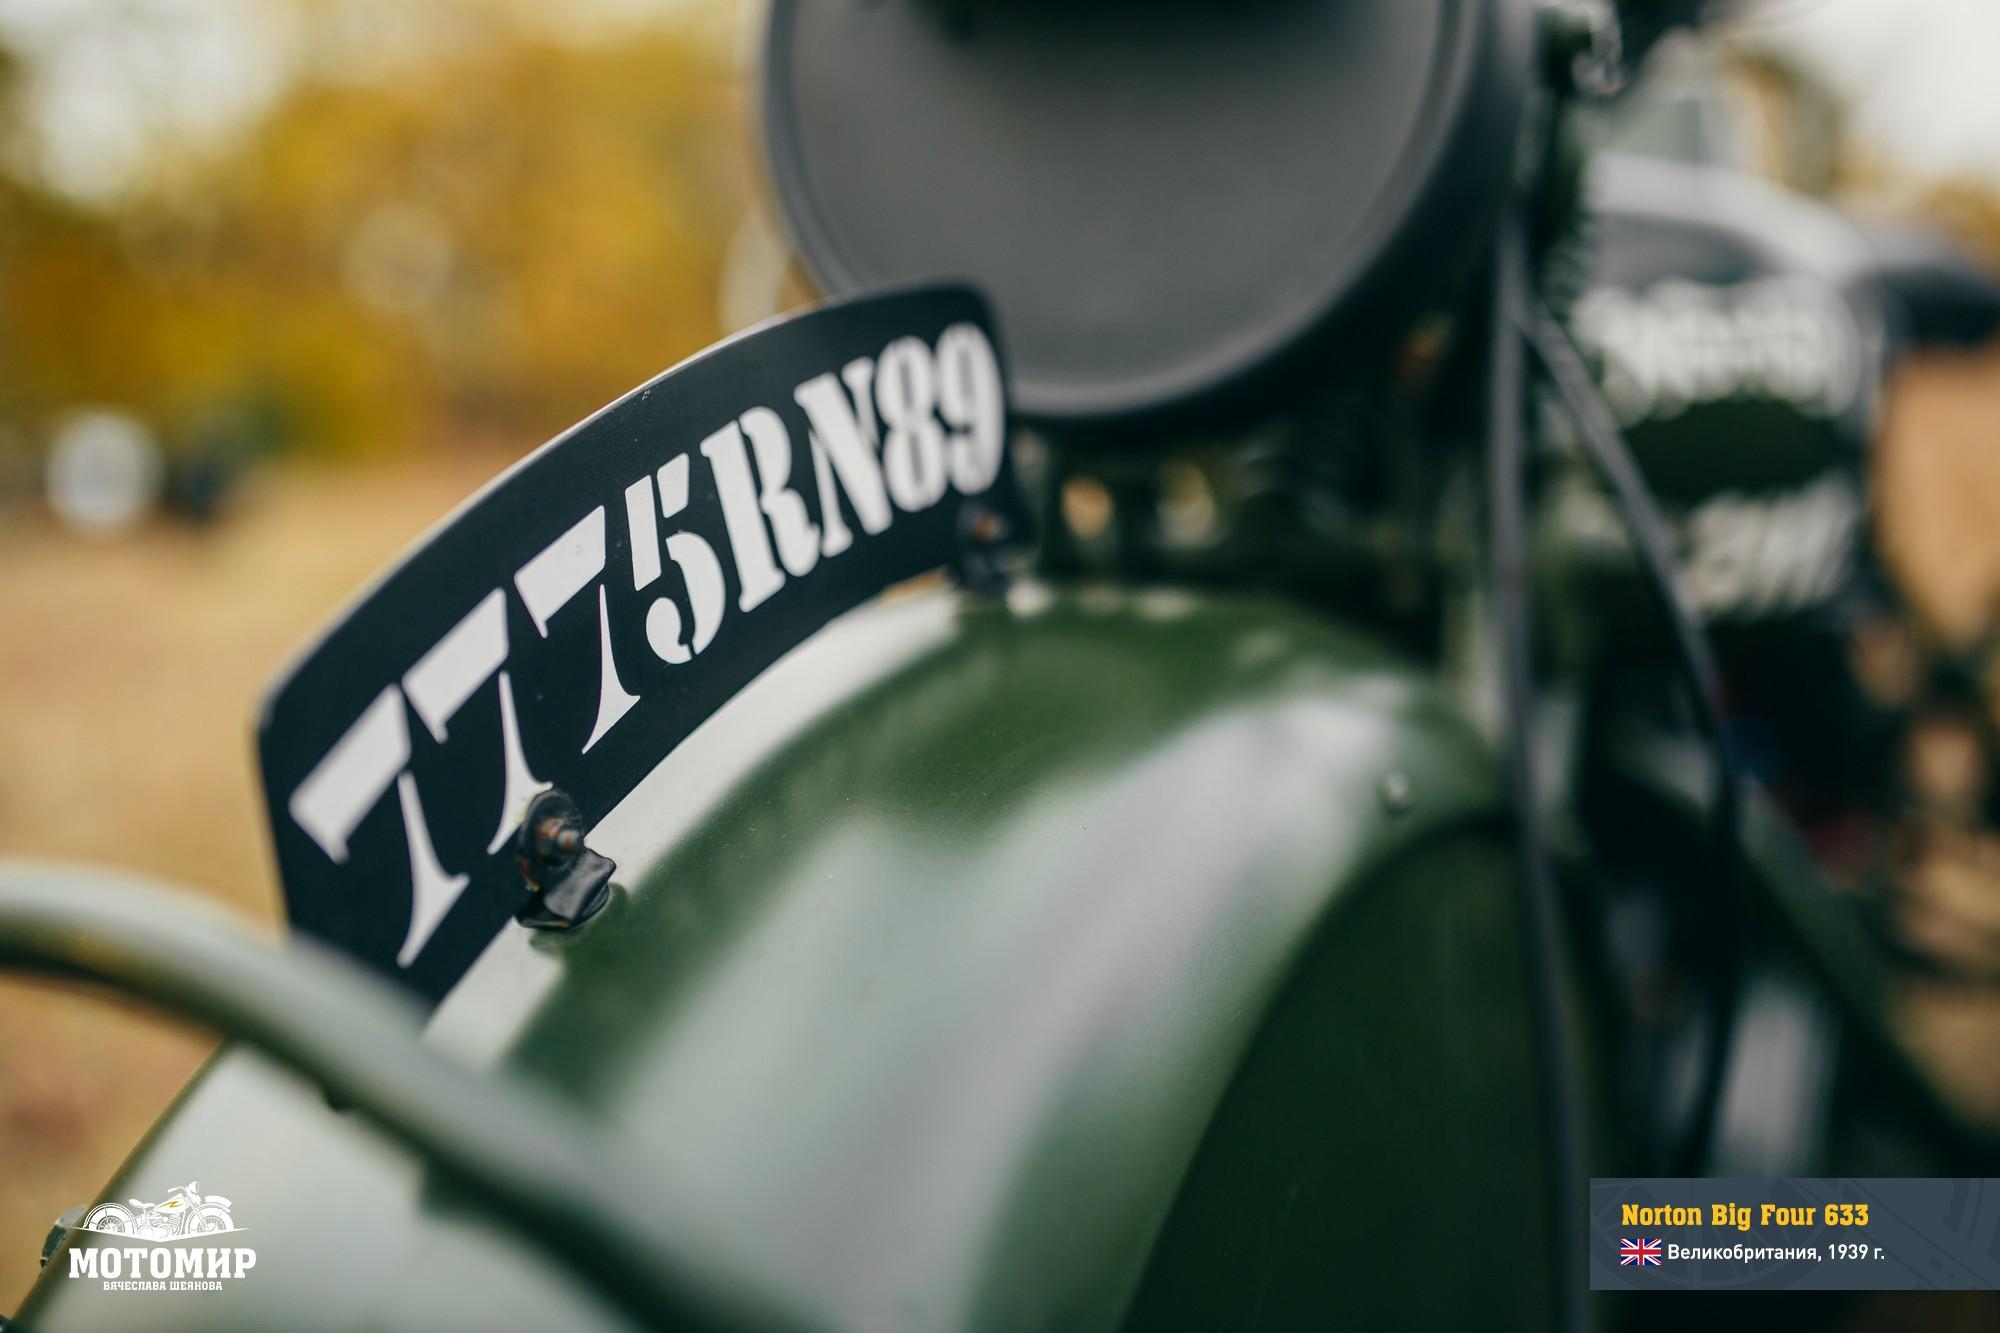 norton-big-four-201510-web-25